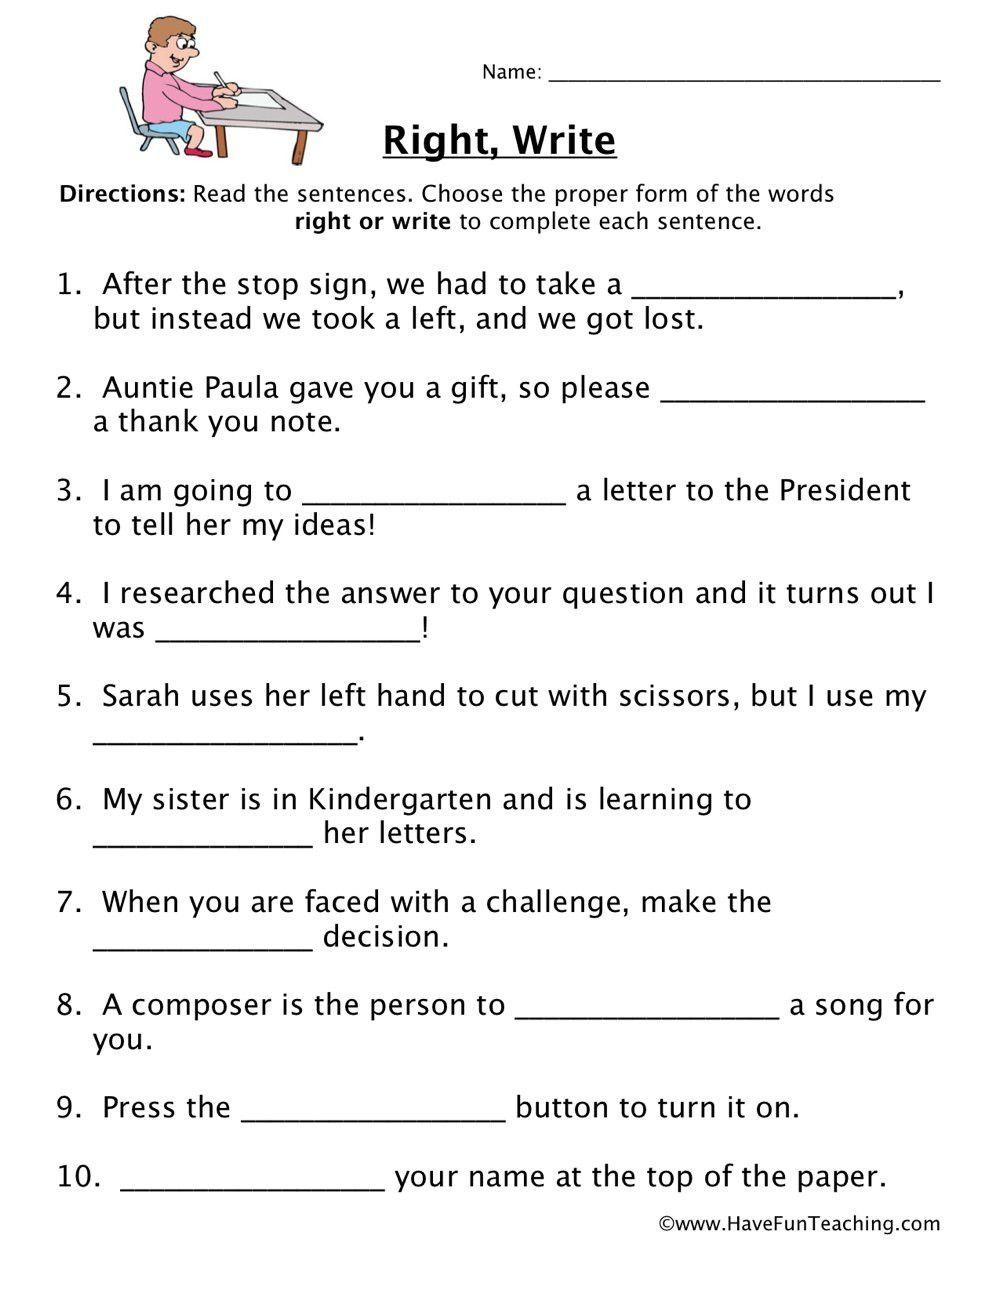 Homophones Worksheets 4th Grade In 2020 Homophones Worksheets Writing Sentences Worksheets Comprehension Worksheets